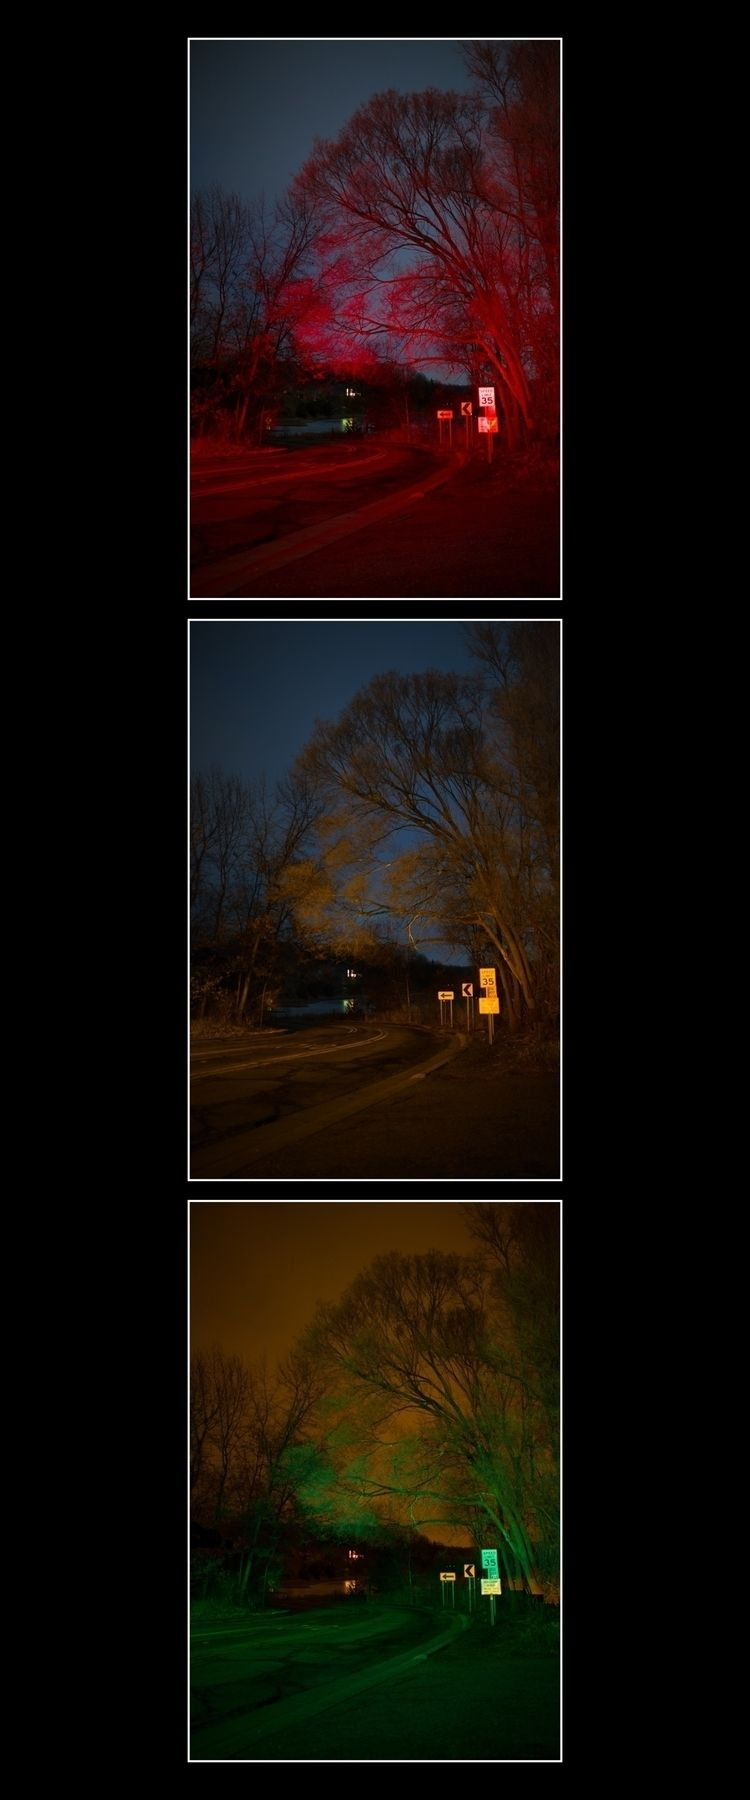 Pedestrian - nightphotography, ello - yeeahspencer | ello